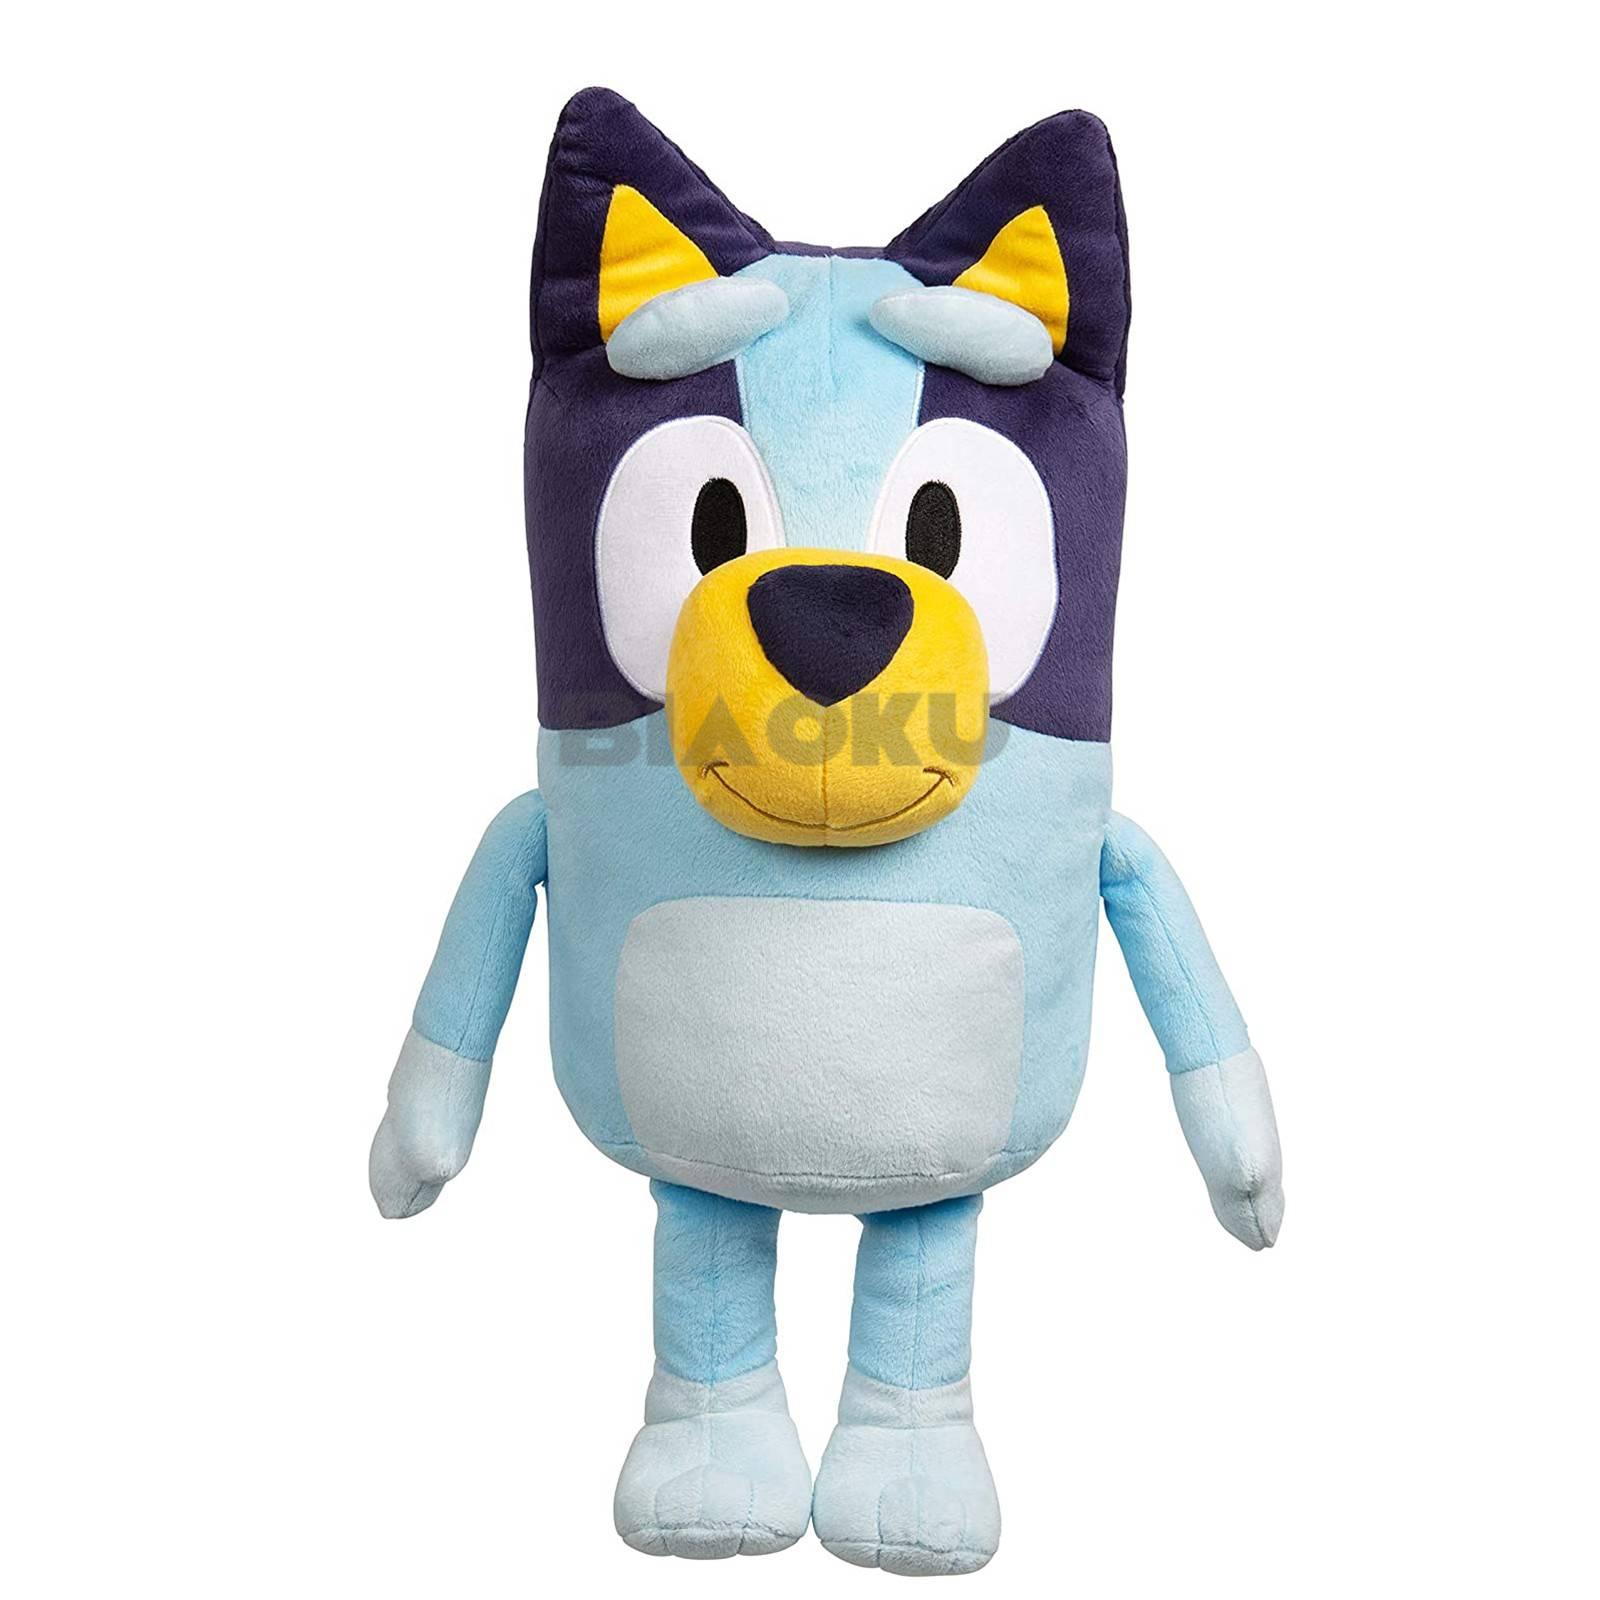 【HOT SALE】28cm Bluey Kids Soft Gift Children Cute Plush Toys Doggy Pupets Doll Soft Cuty Stuffed Toy Bluey Bingo Plush Doll Toy